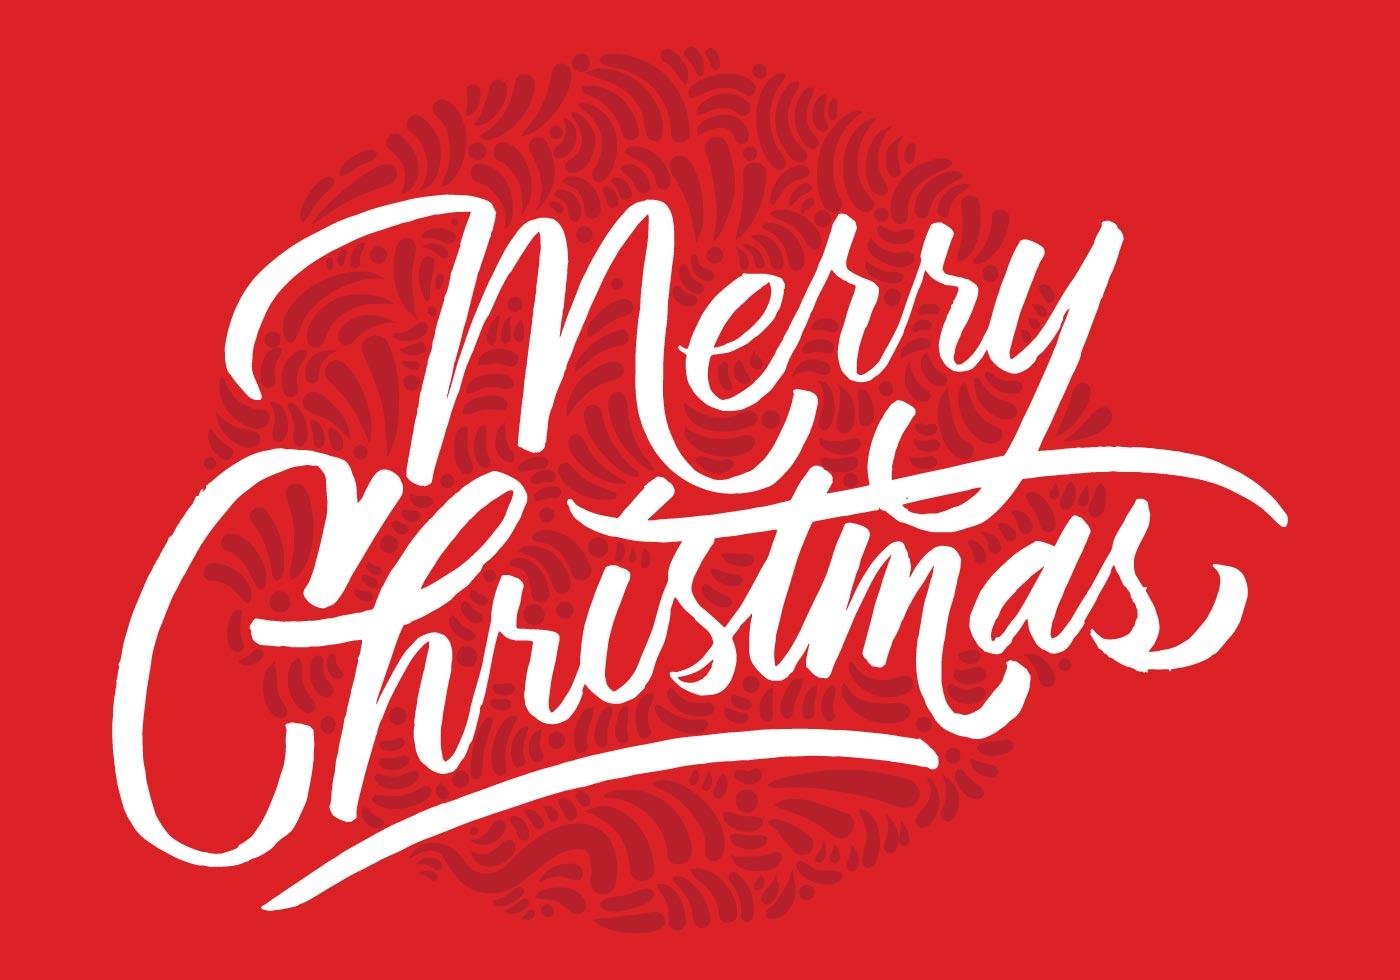 1400x980 Merry Christmas Brush Script Vector